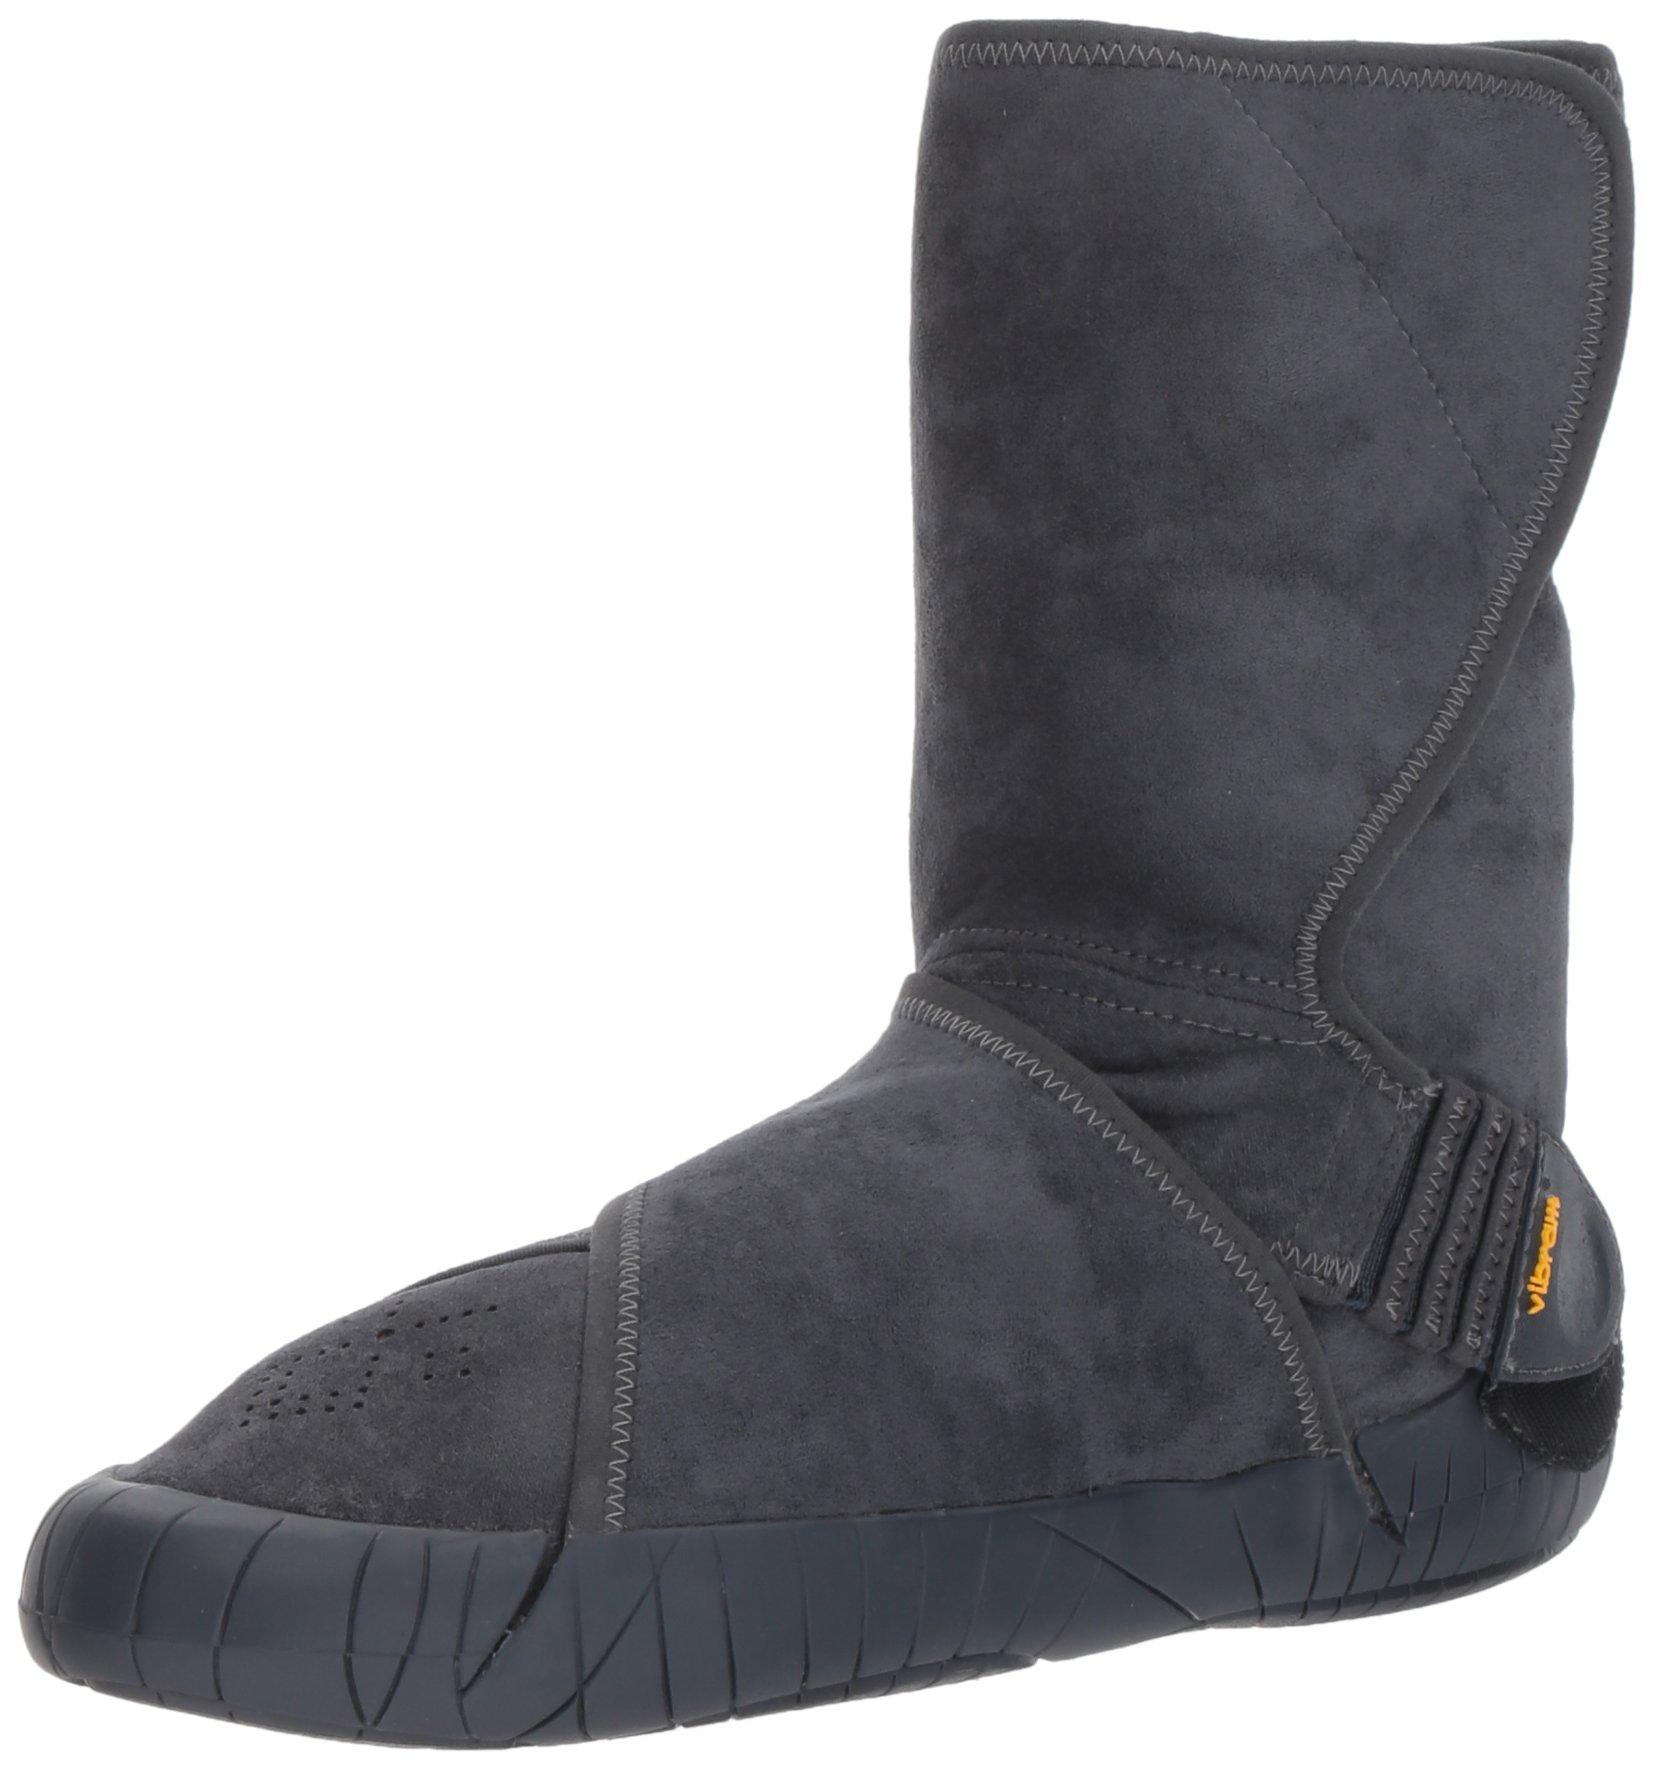 Vibram Eu boot Classiques AdulteGrisgrey40 TravelerBottesamp; Bottines Fivefingers Mid 41 Mixte Eastern 9eDWEYb2IH